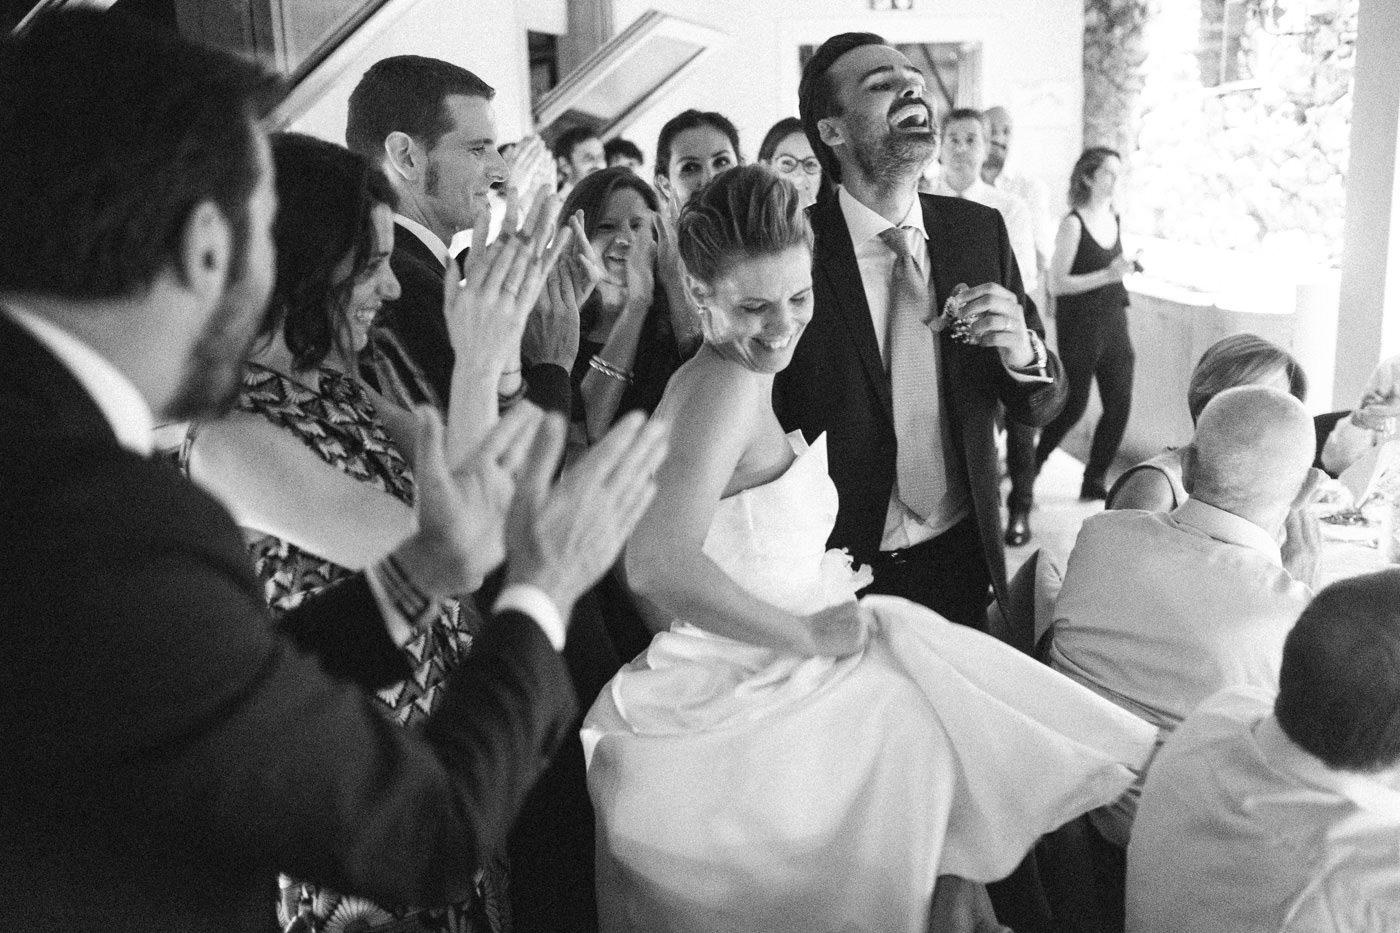 matrimoni_all_italiana_fotografo_matrimonio_cinque_terre-69.jpg